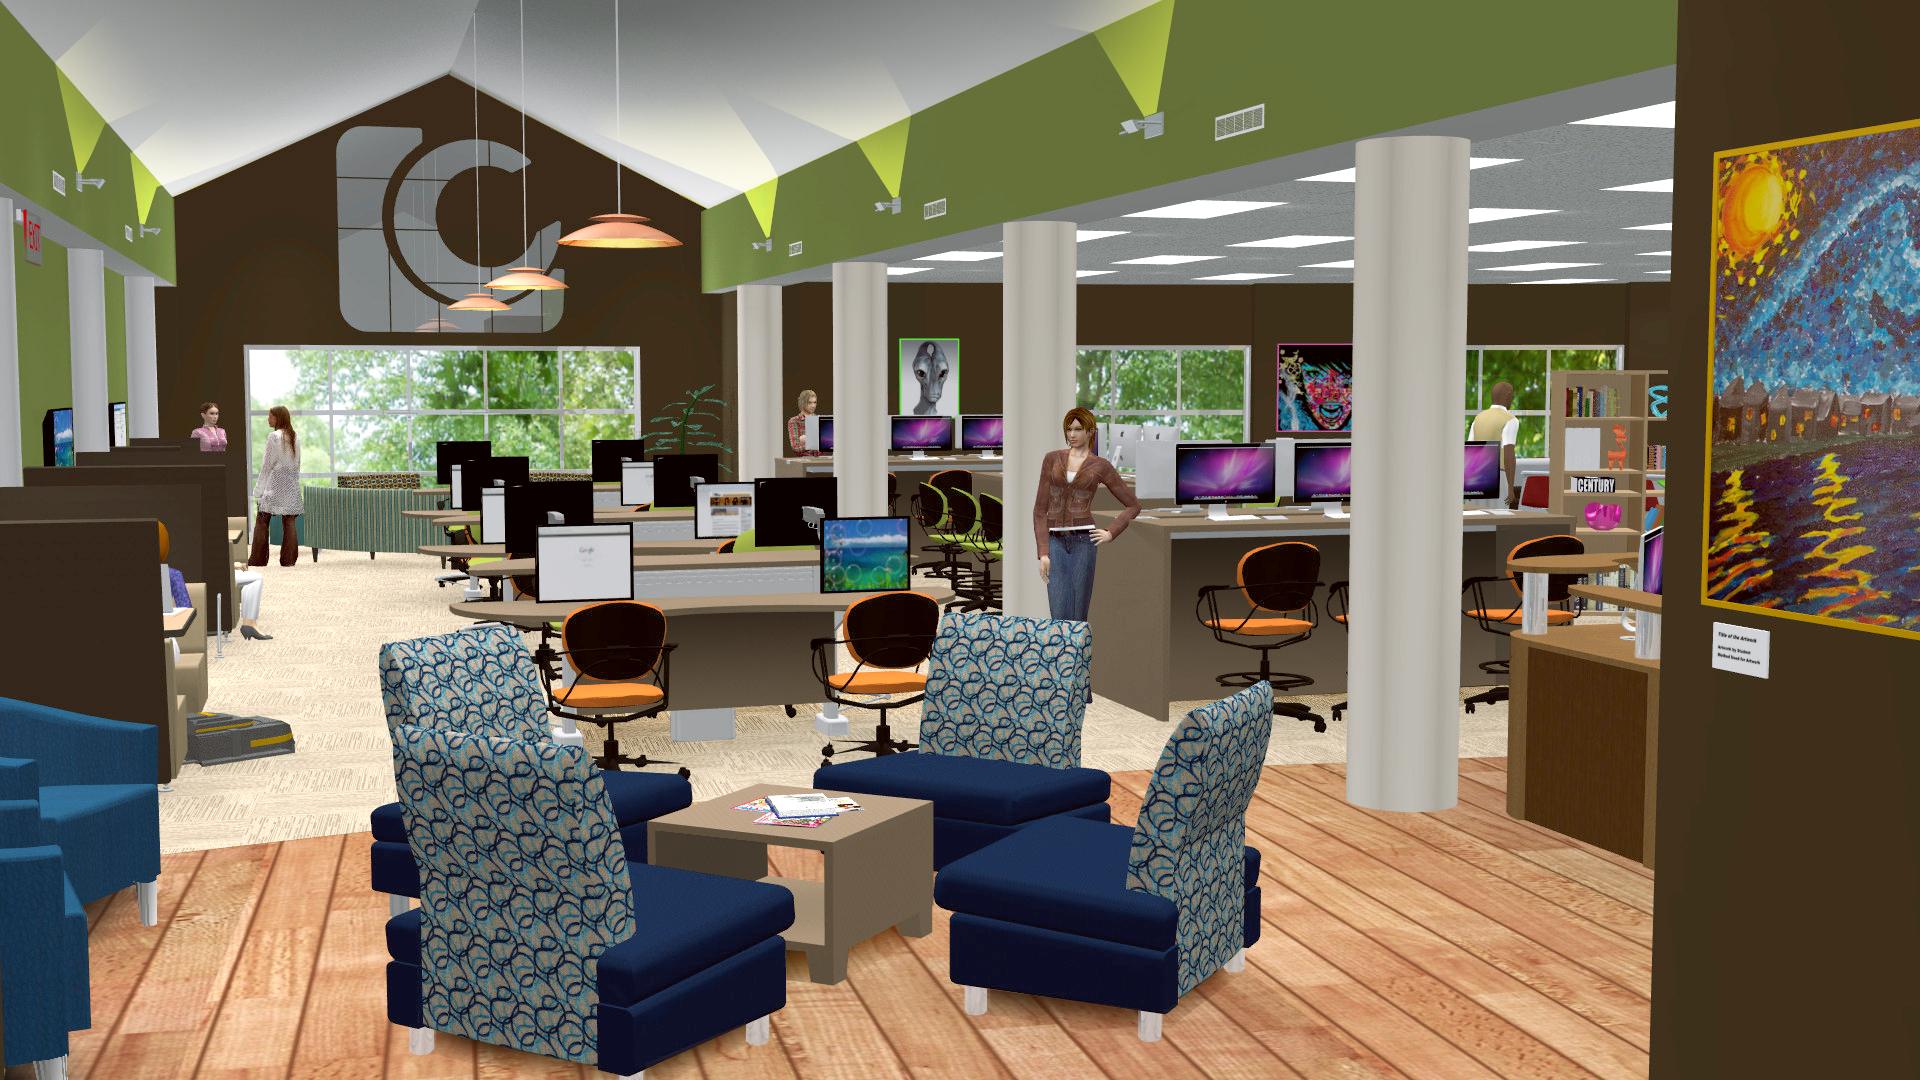 School Library Concept